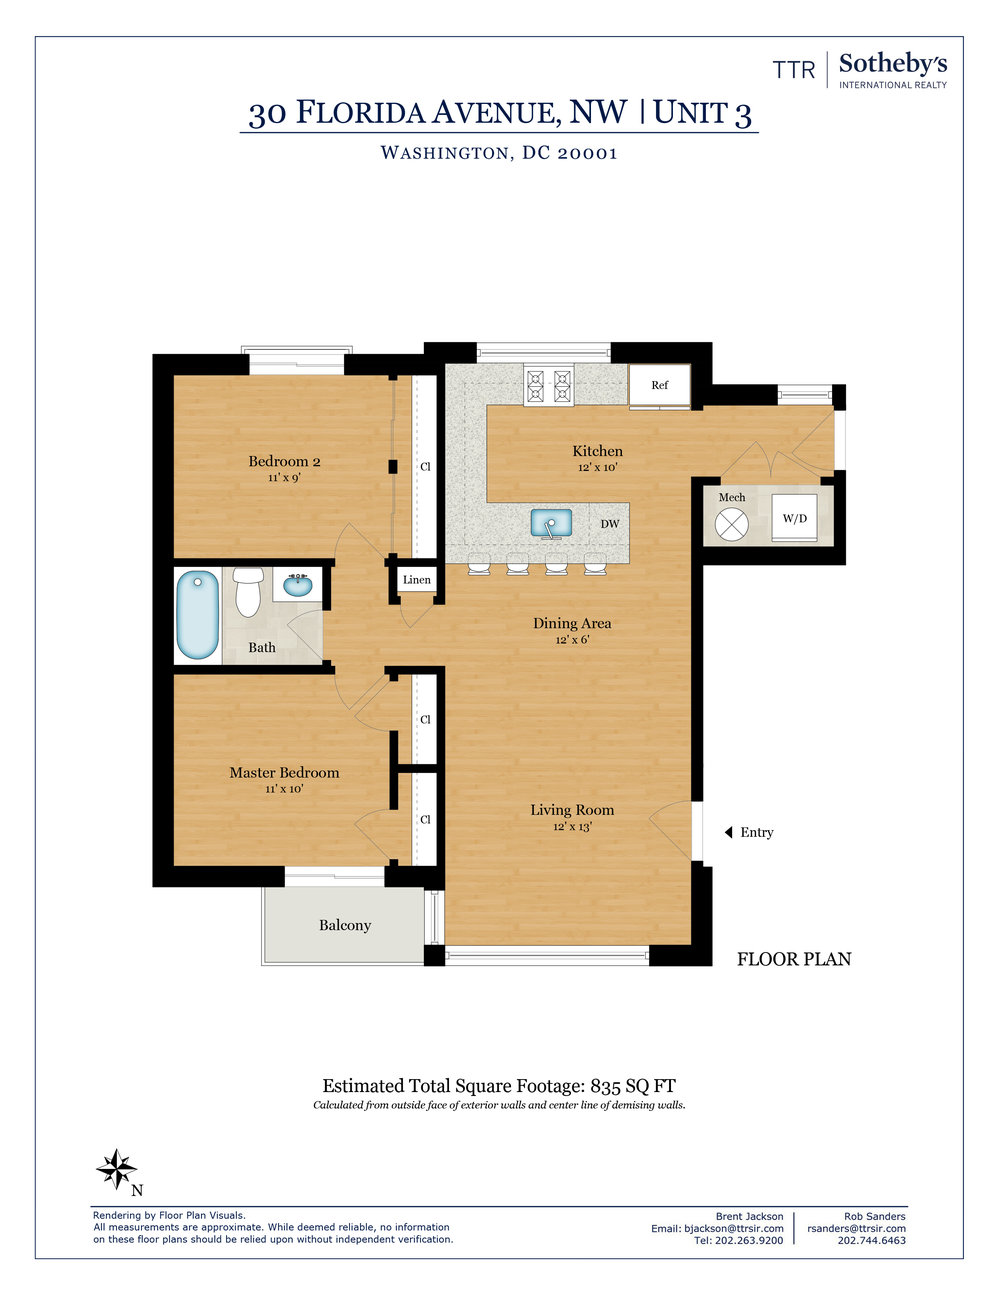 BJ-30FloridaAveNW#3-FloorPlan-Print-R1.jpg